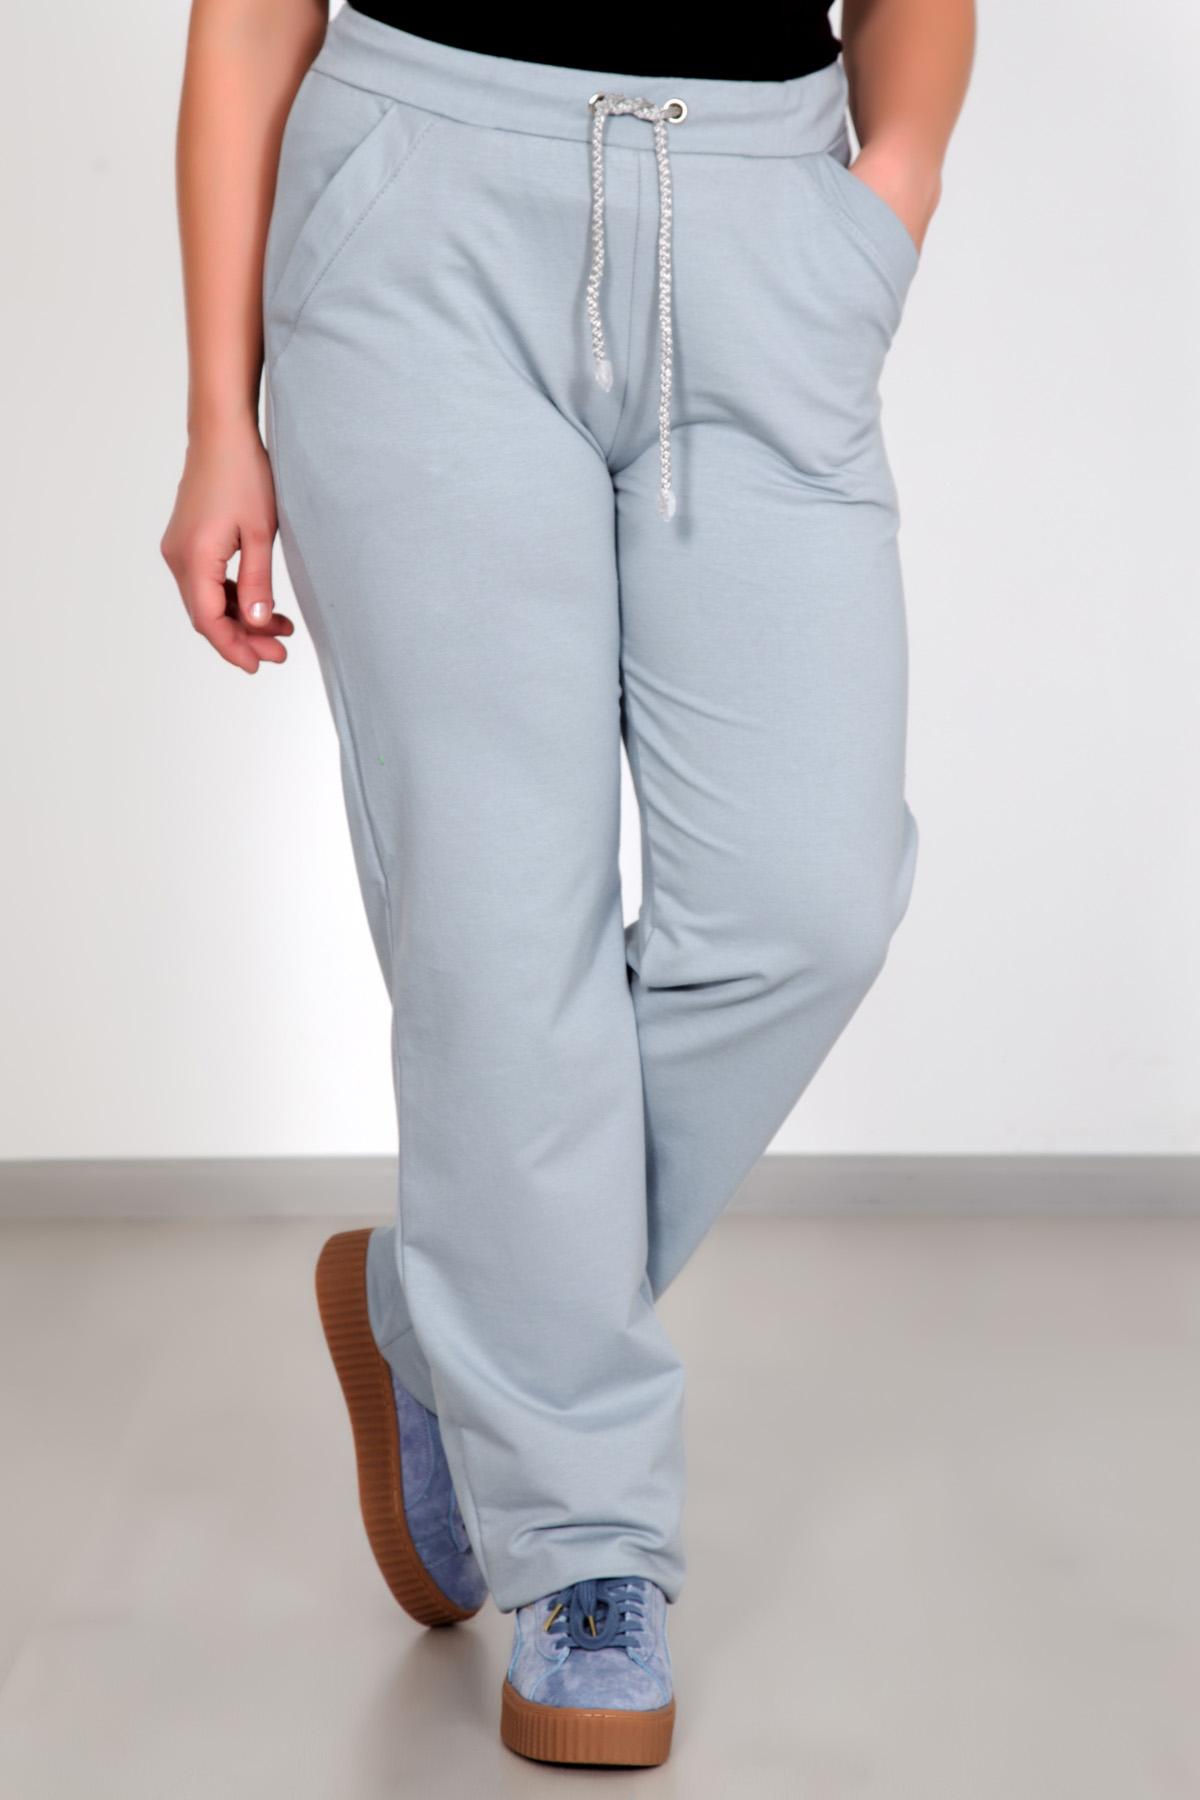 Жен. брюки  Элси  р. 52 - Женская одежда артикул: 25548